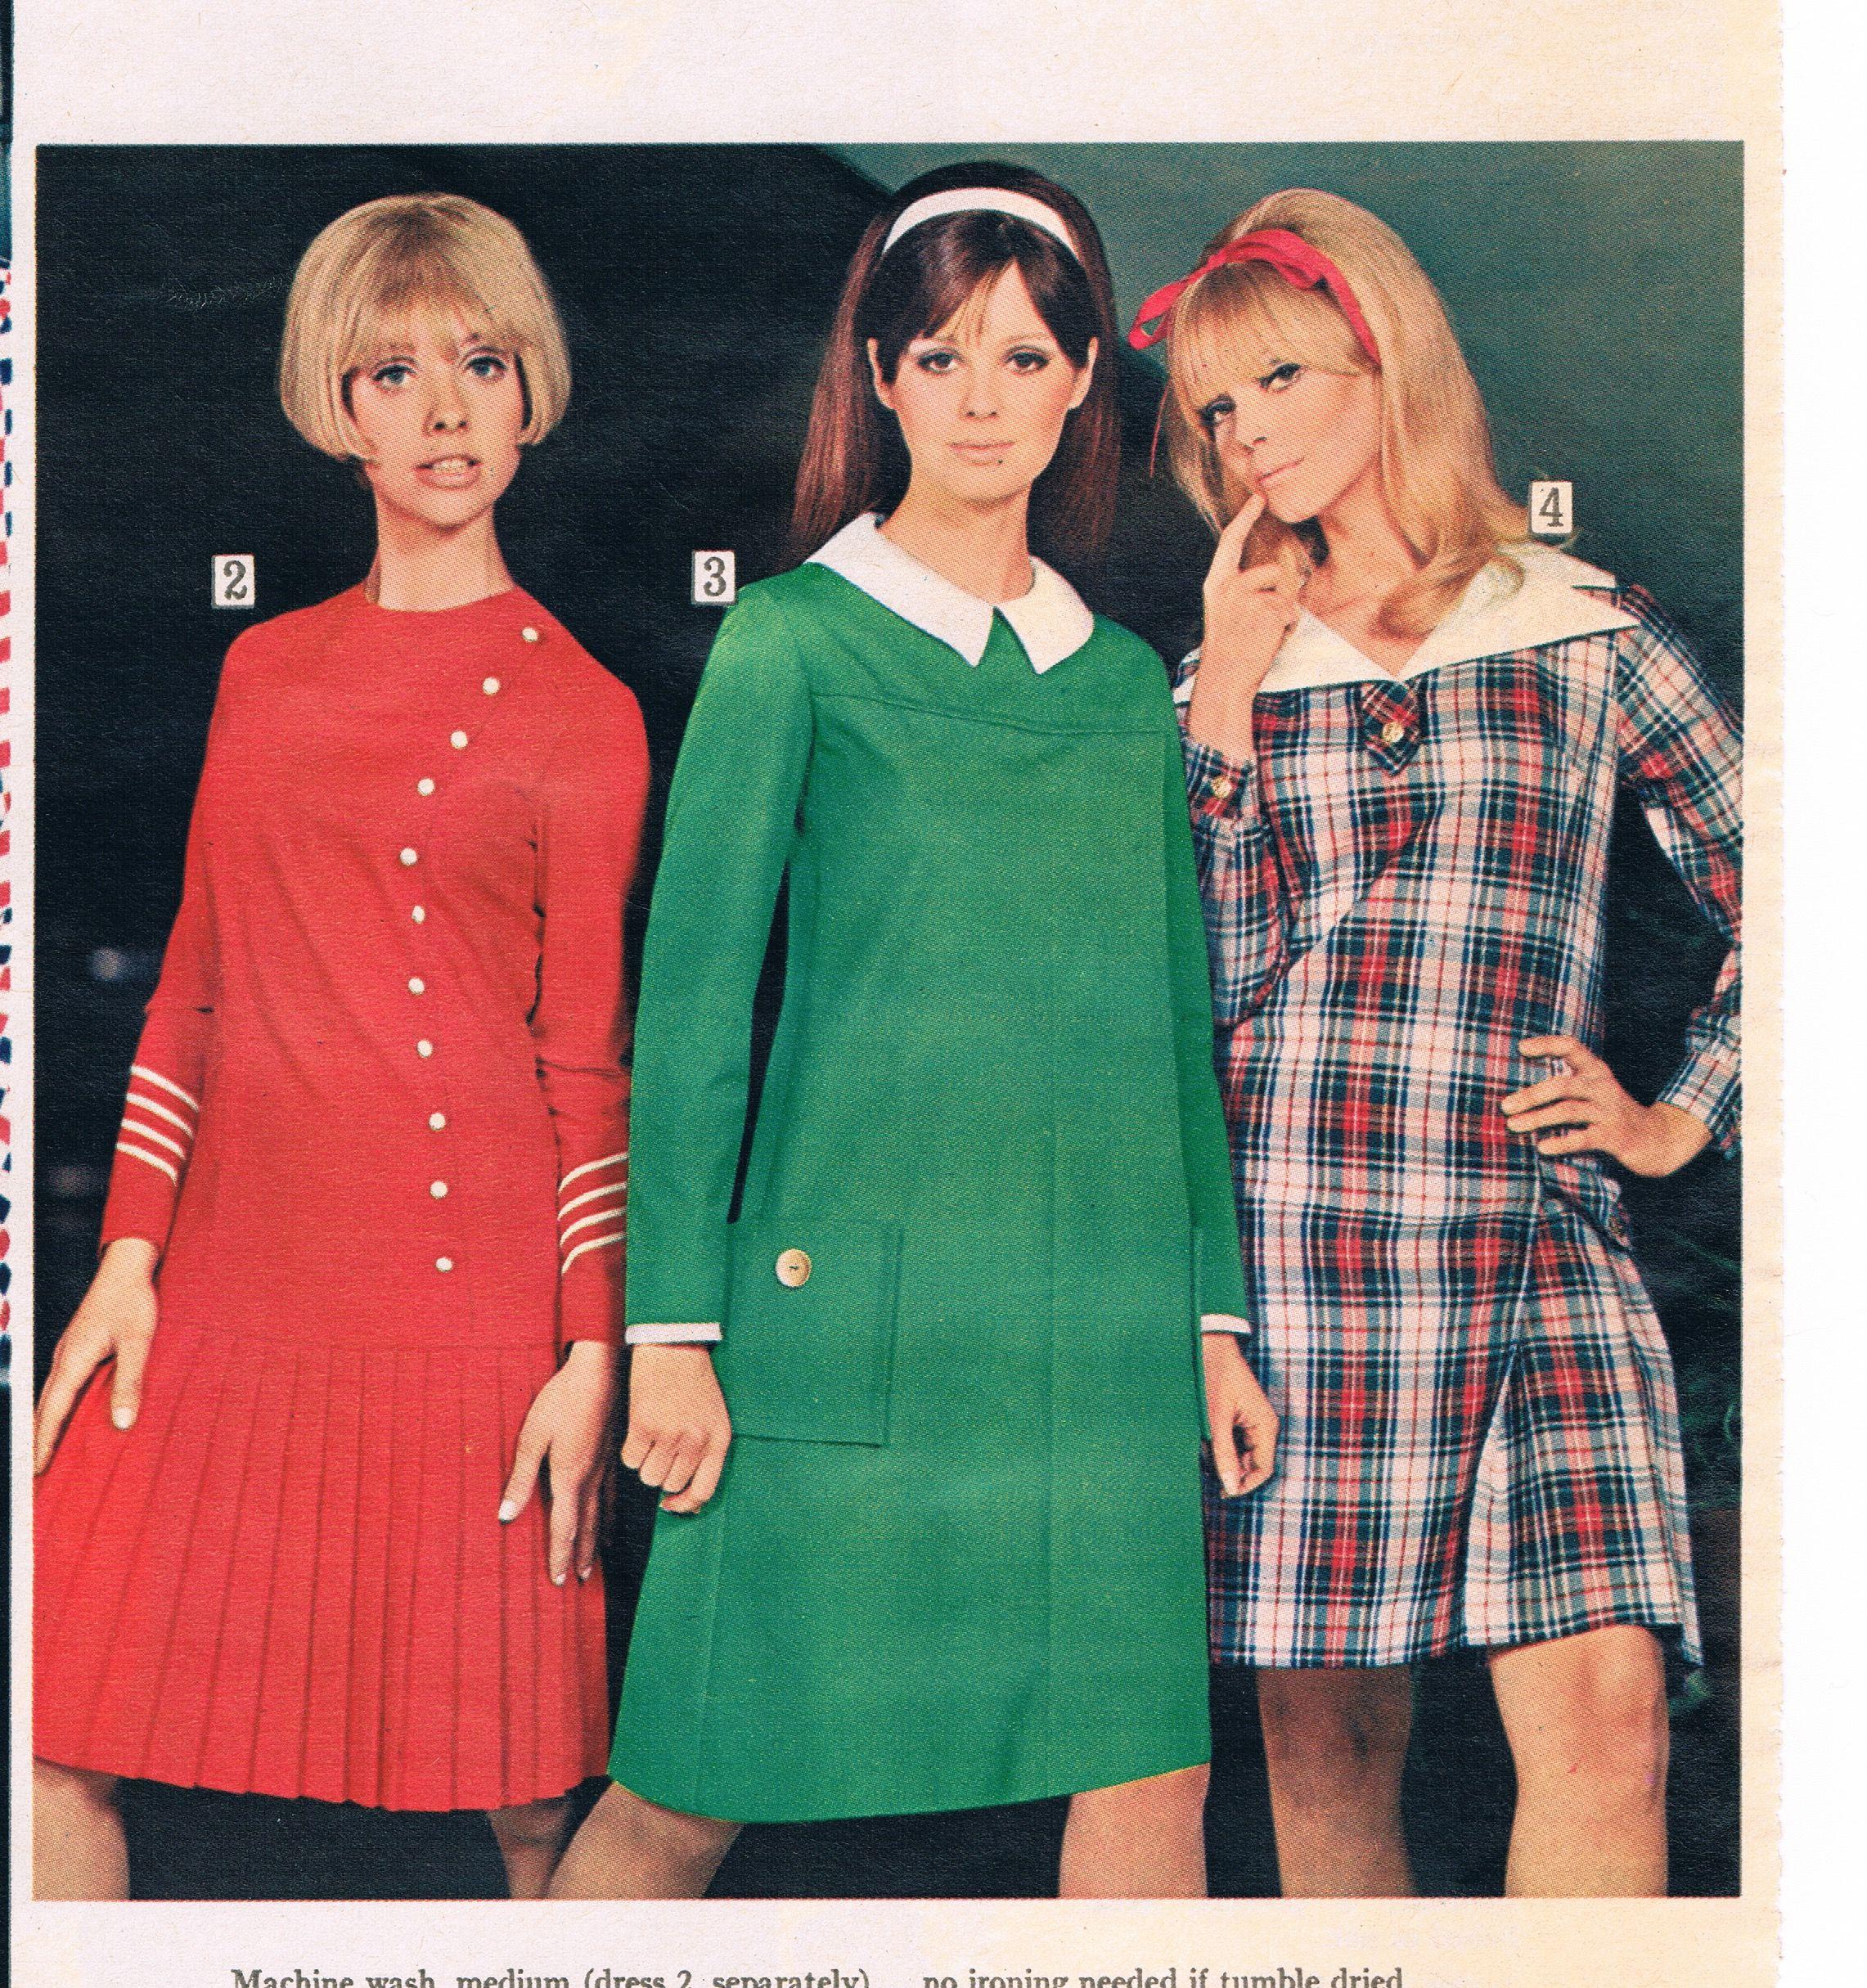 Sears Catalog Dress Fashion 1979